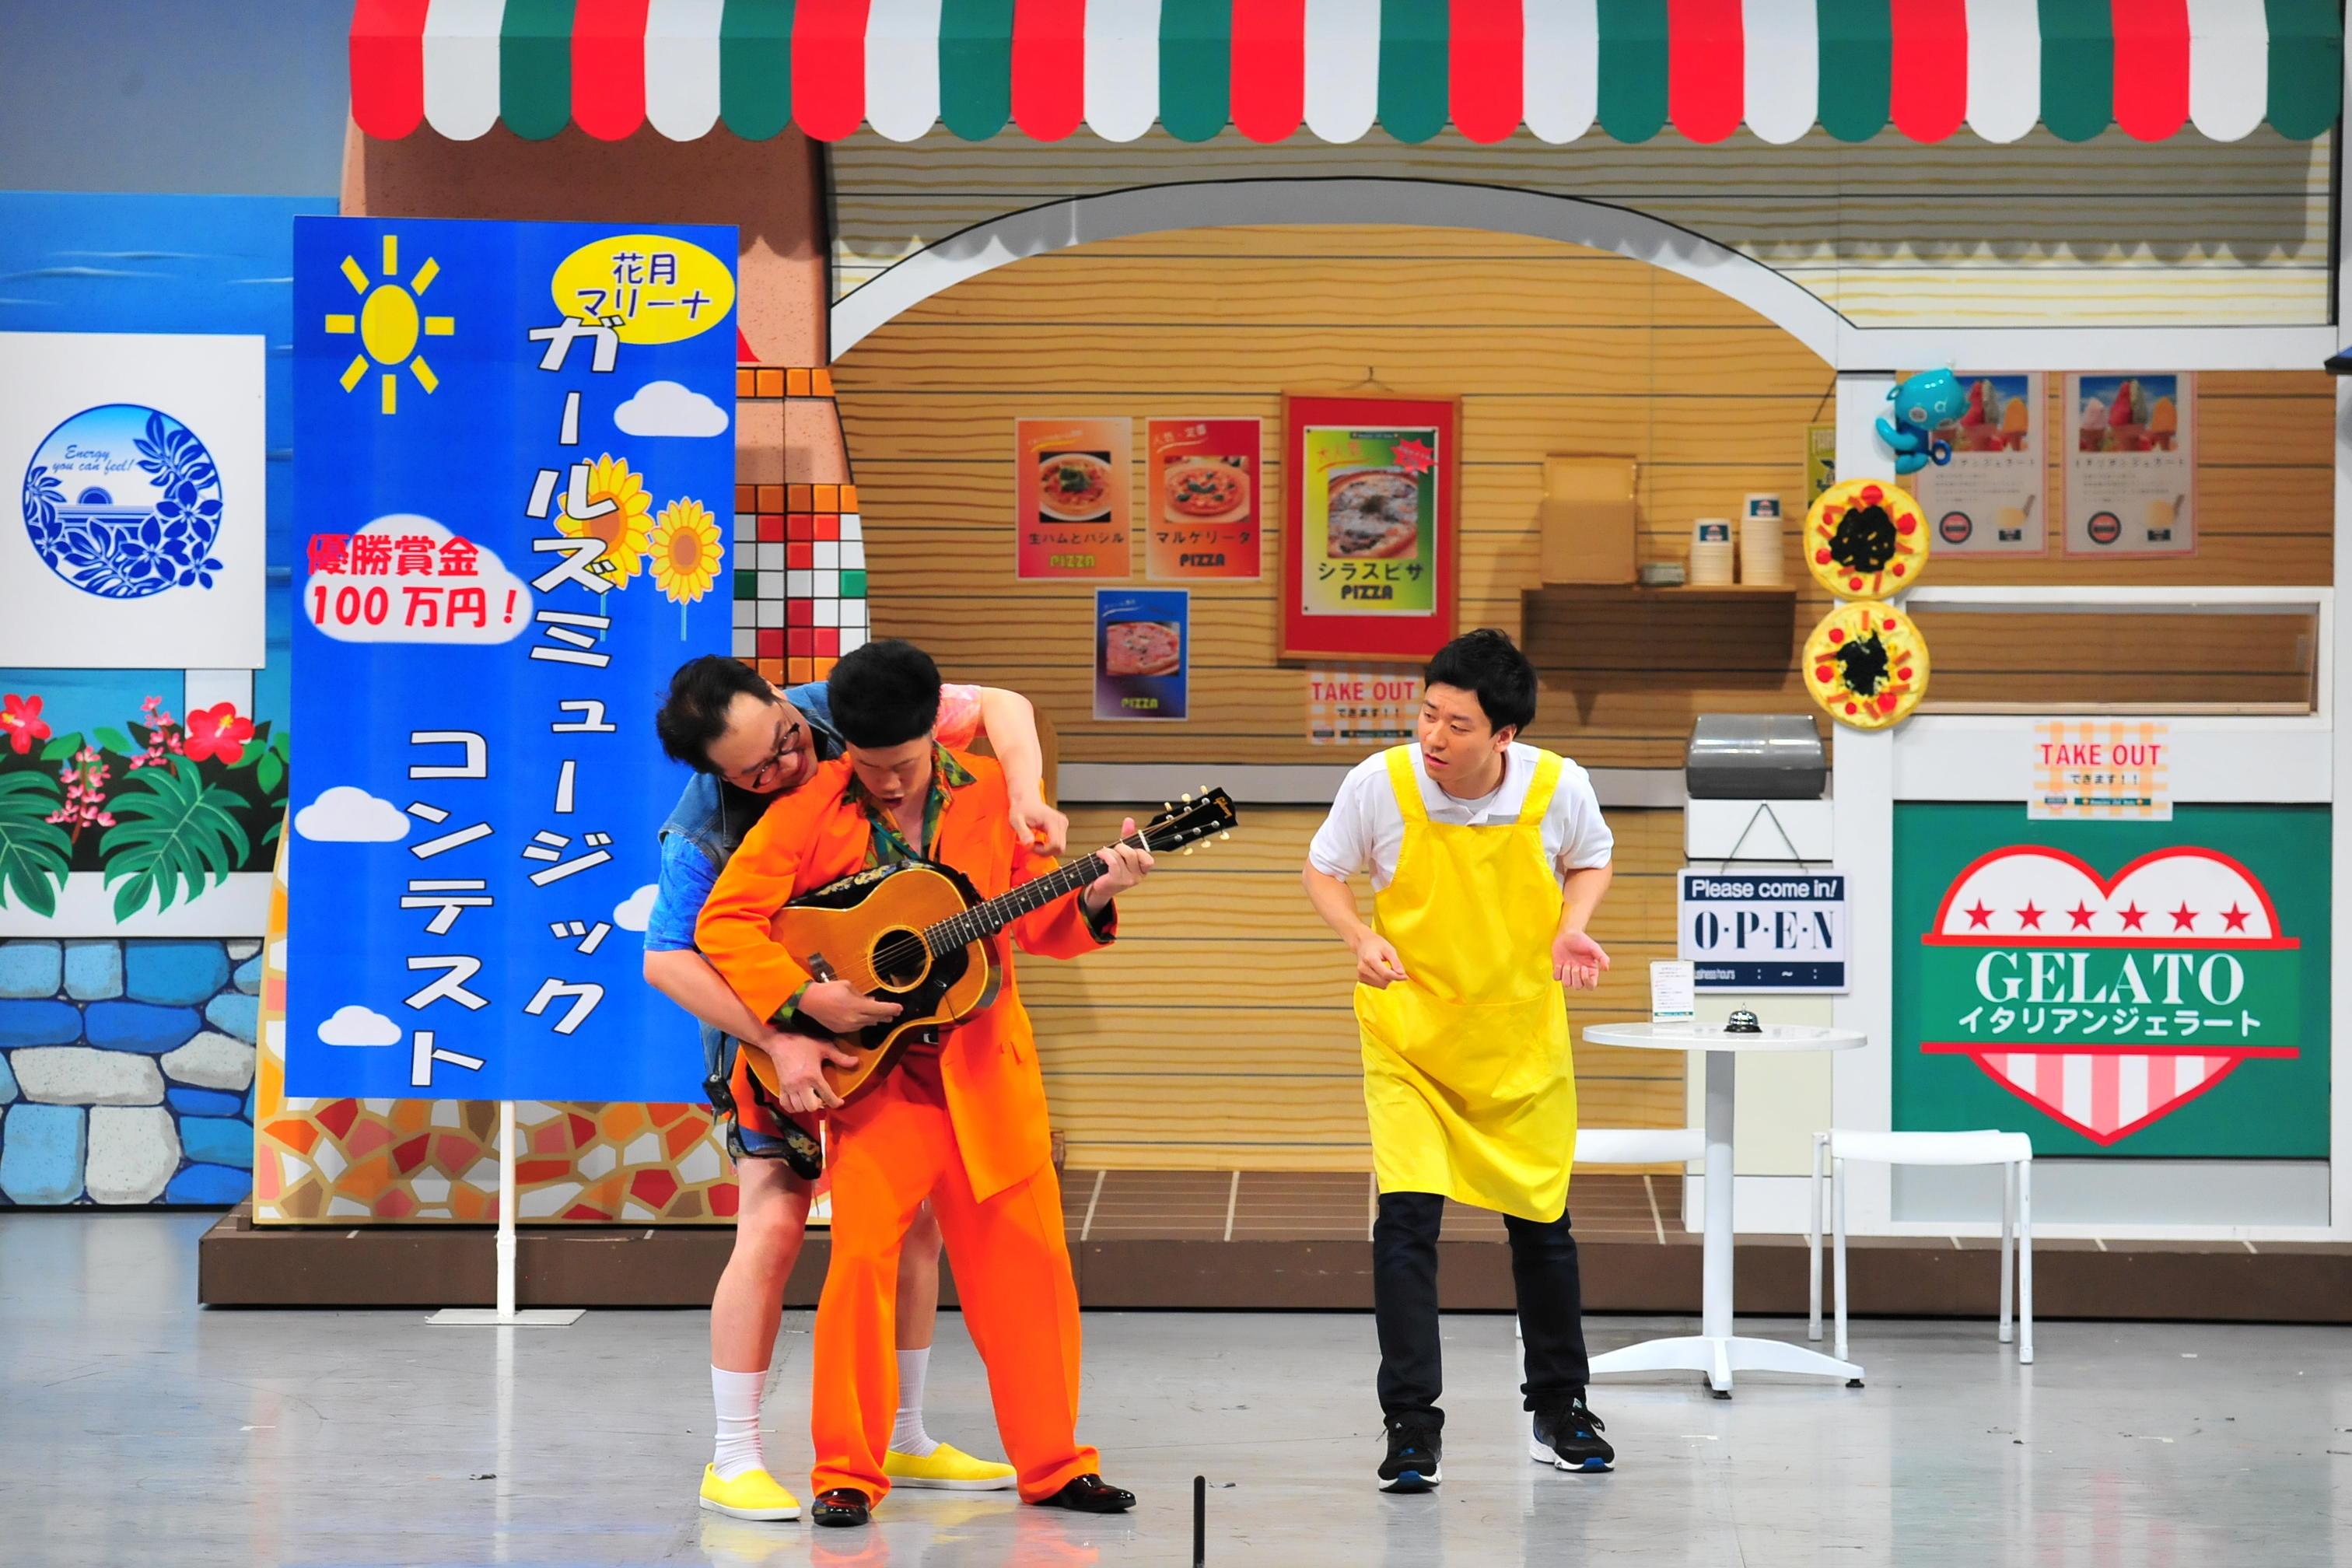 http://news.yoshimoto.co.jp/20160814183512-850b0fbac8cbe33537ca43a09583672926528eb2.jpg